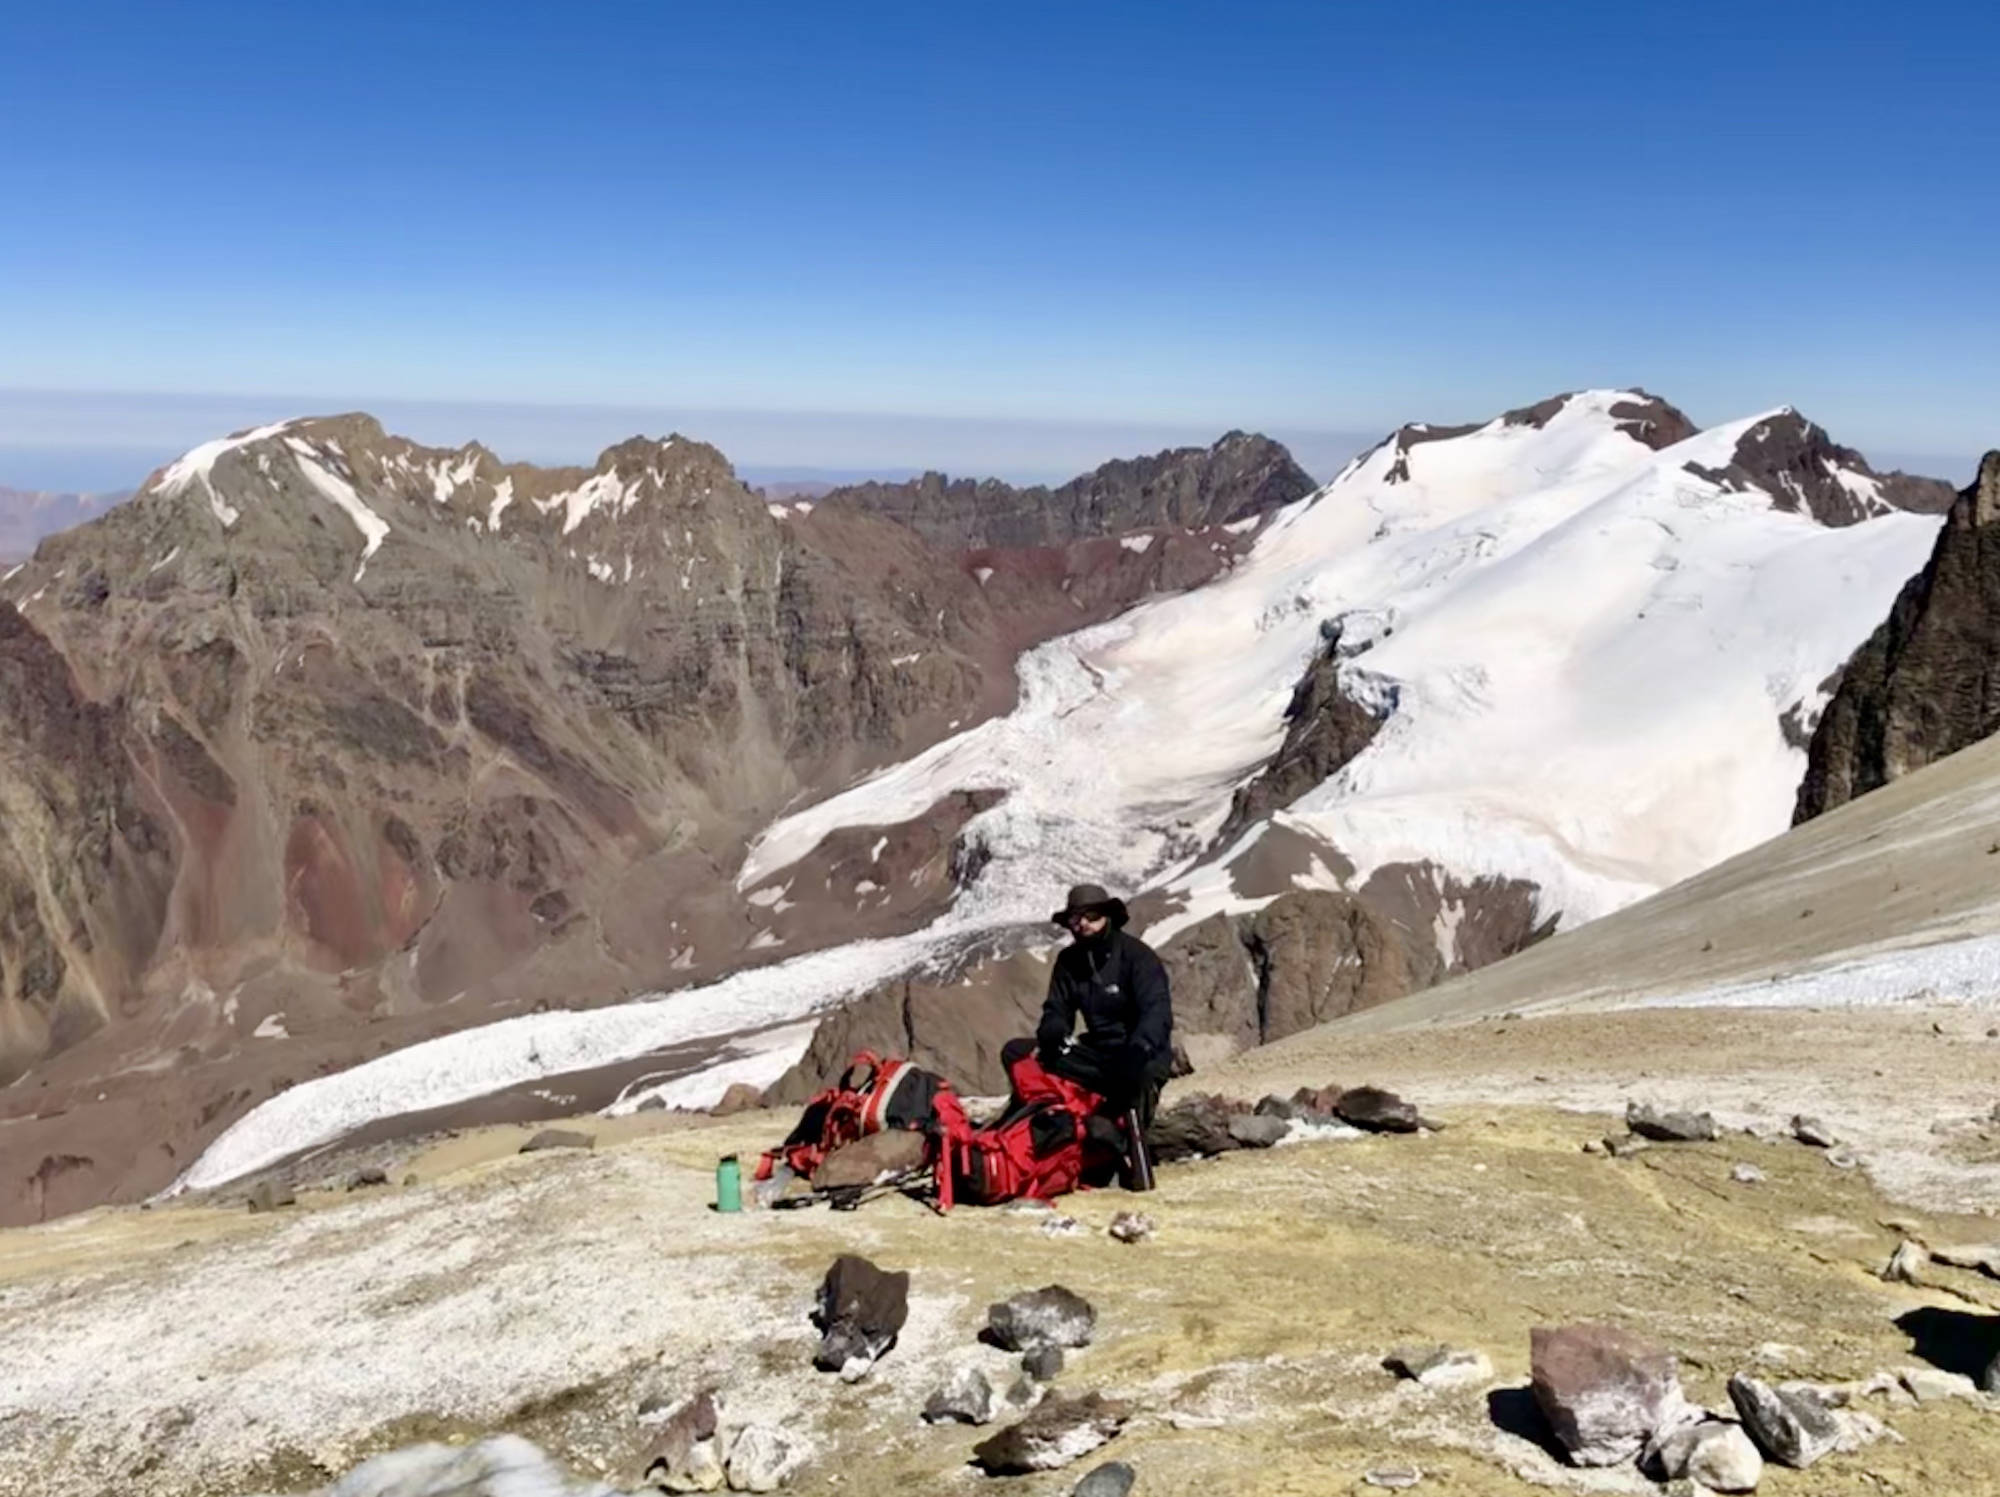 Ascension de l'Aconcagua